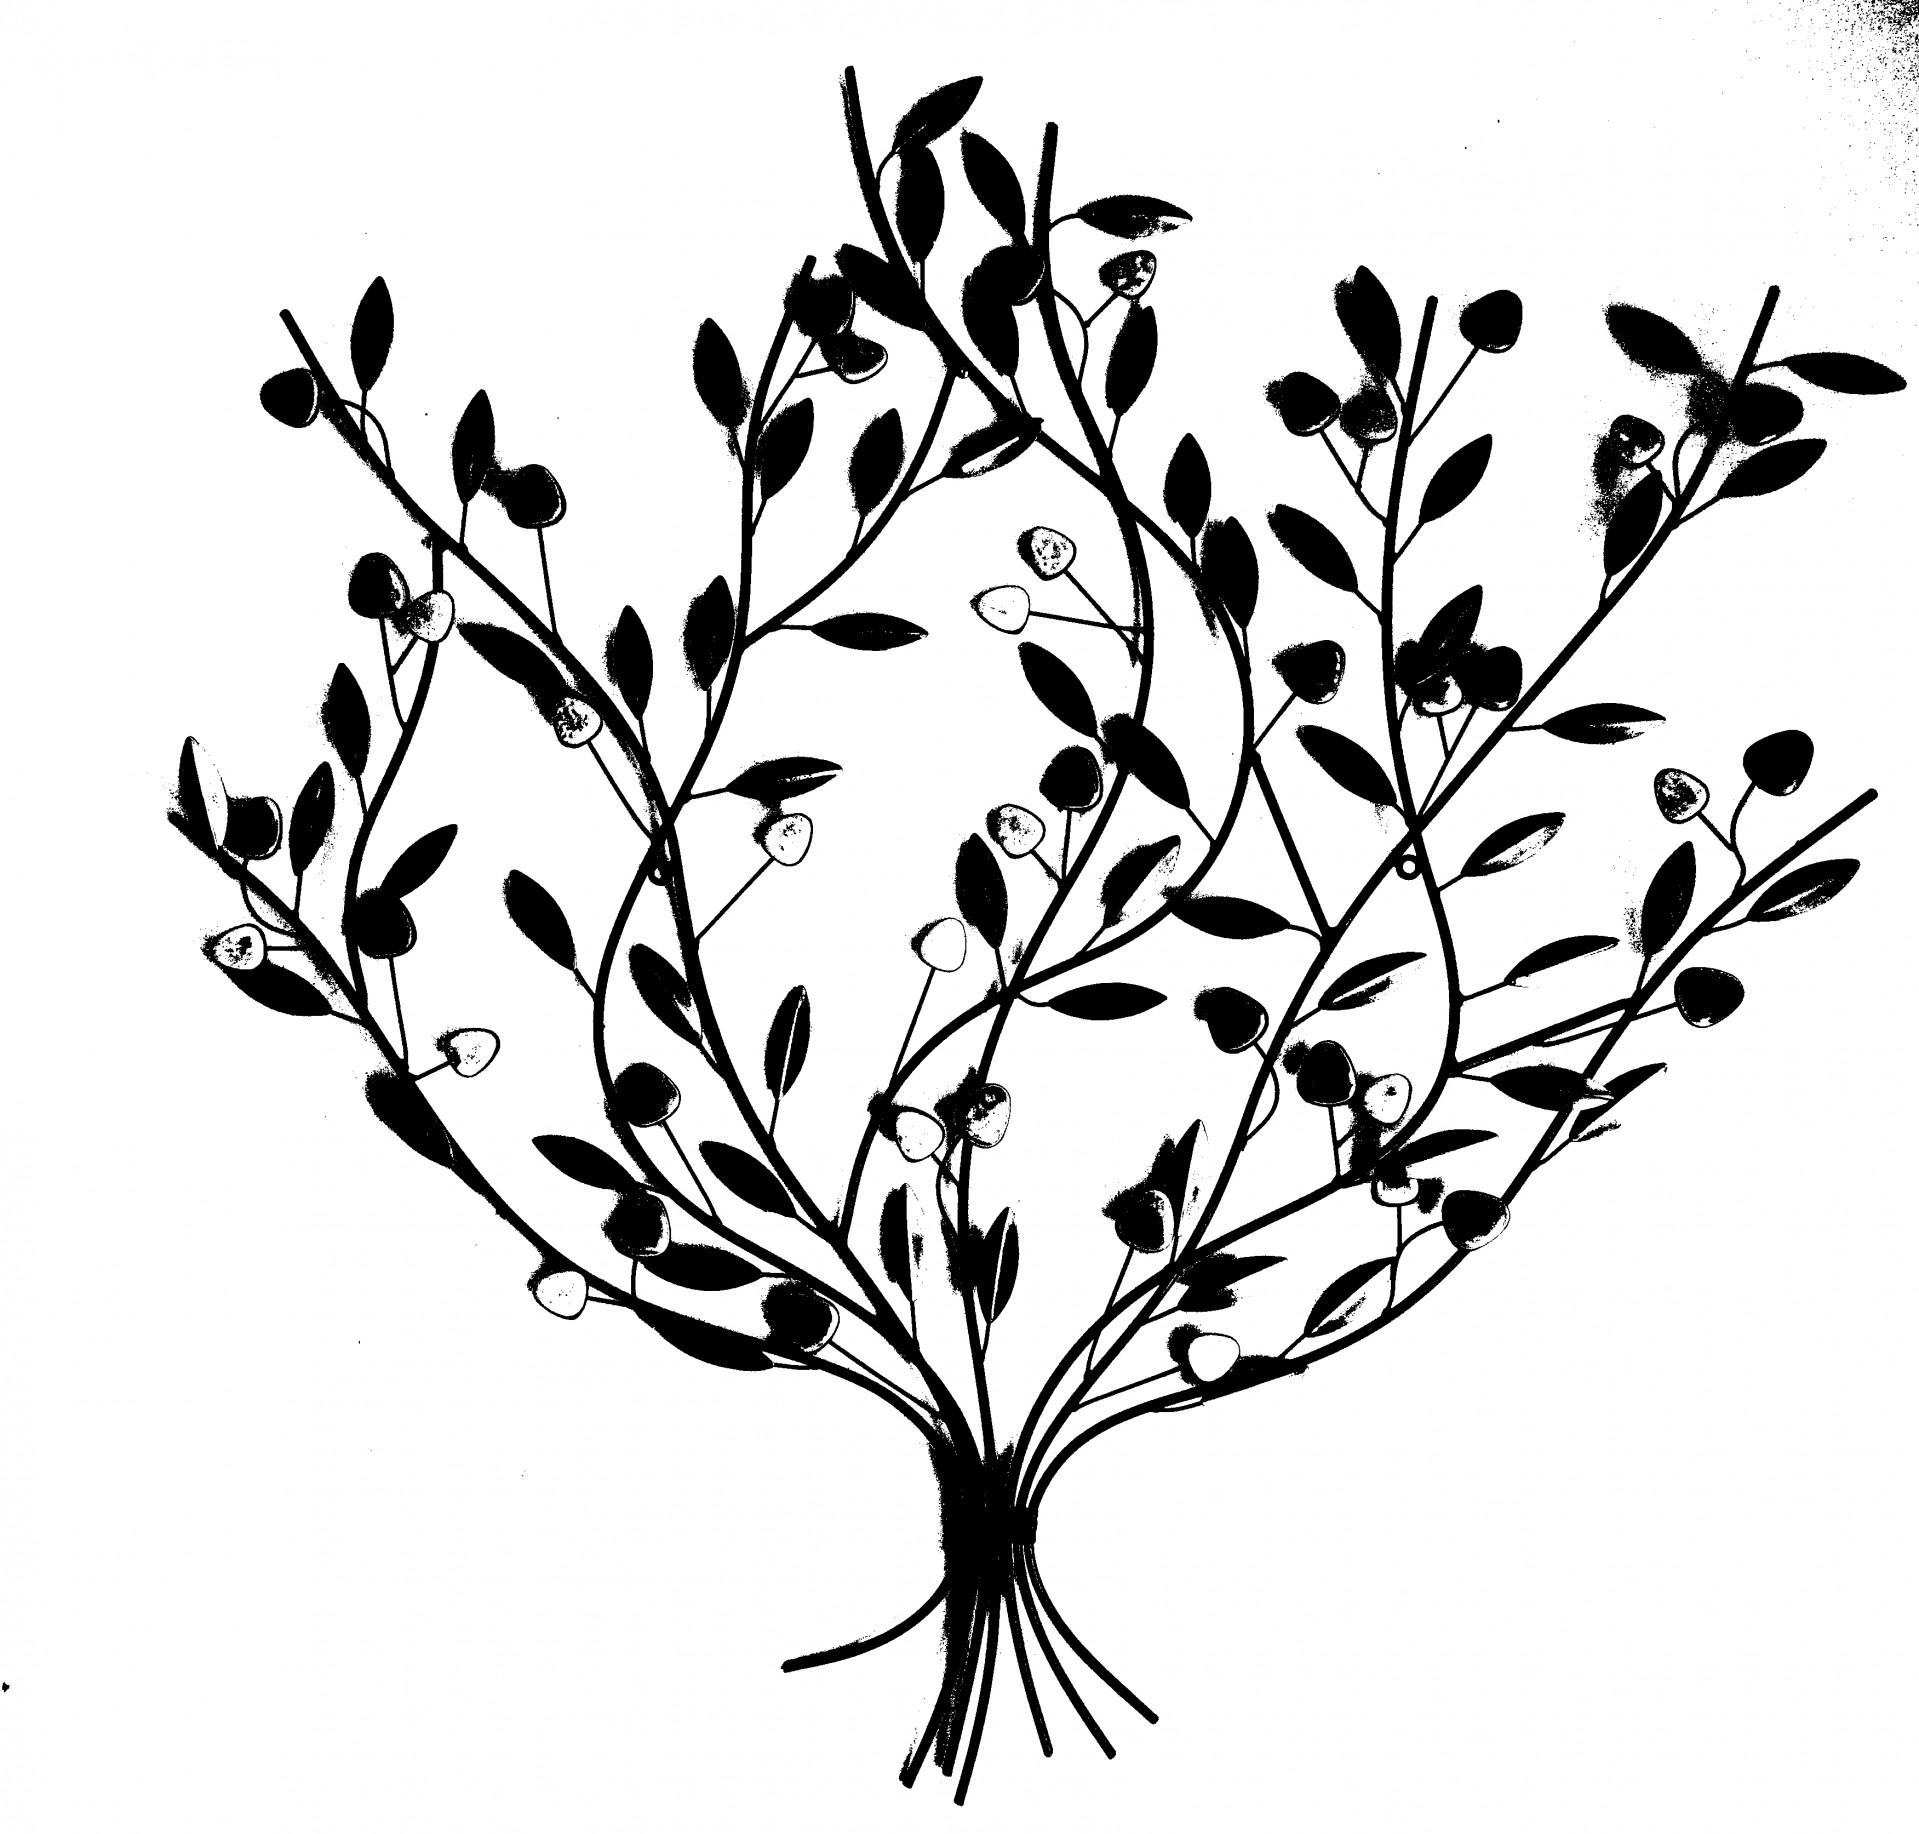 Plant Silhouette Free Stock Photo - Public Domain Pictures